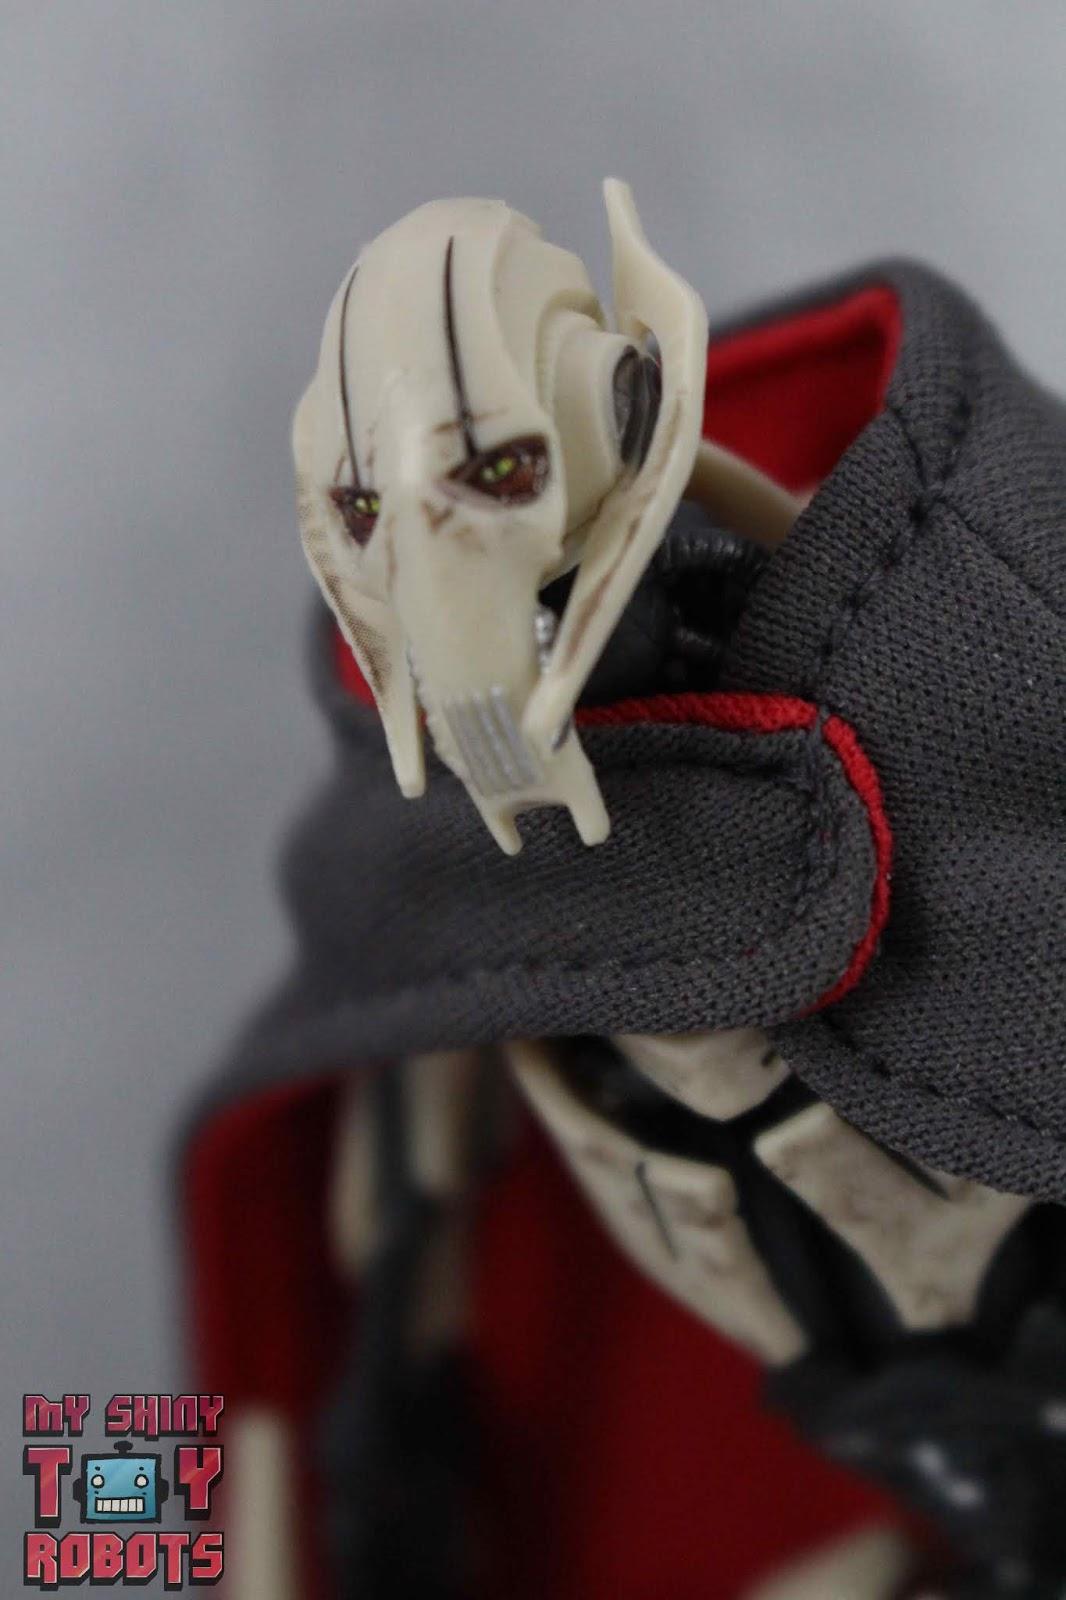 Multi-peg 5 x Star Wars Black Series 6 inch Action Figure Stands BLACK